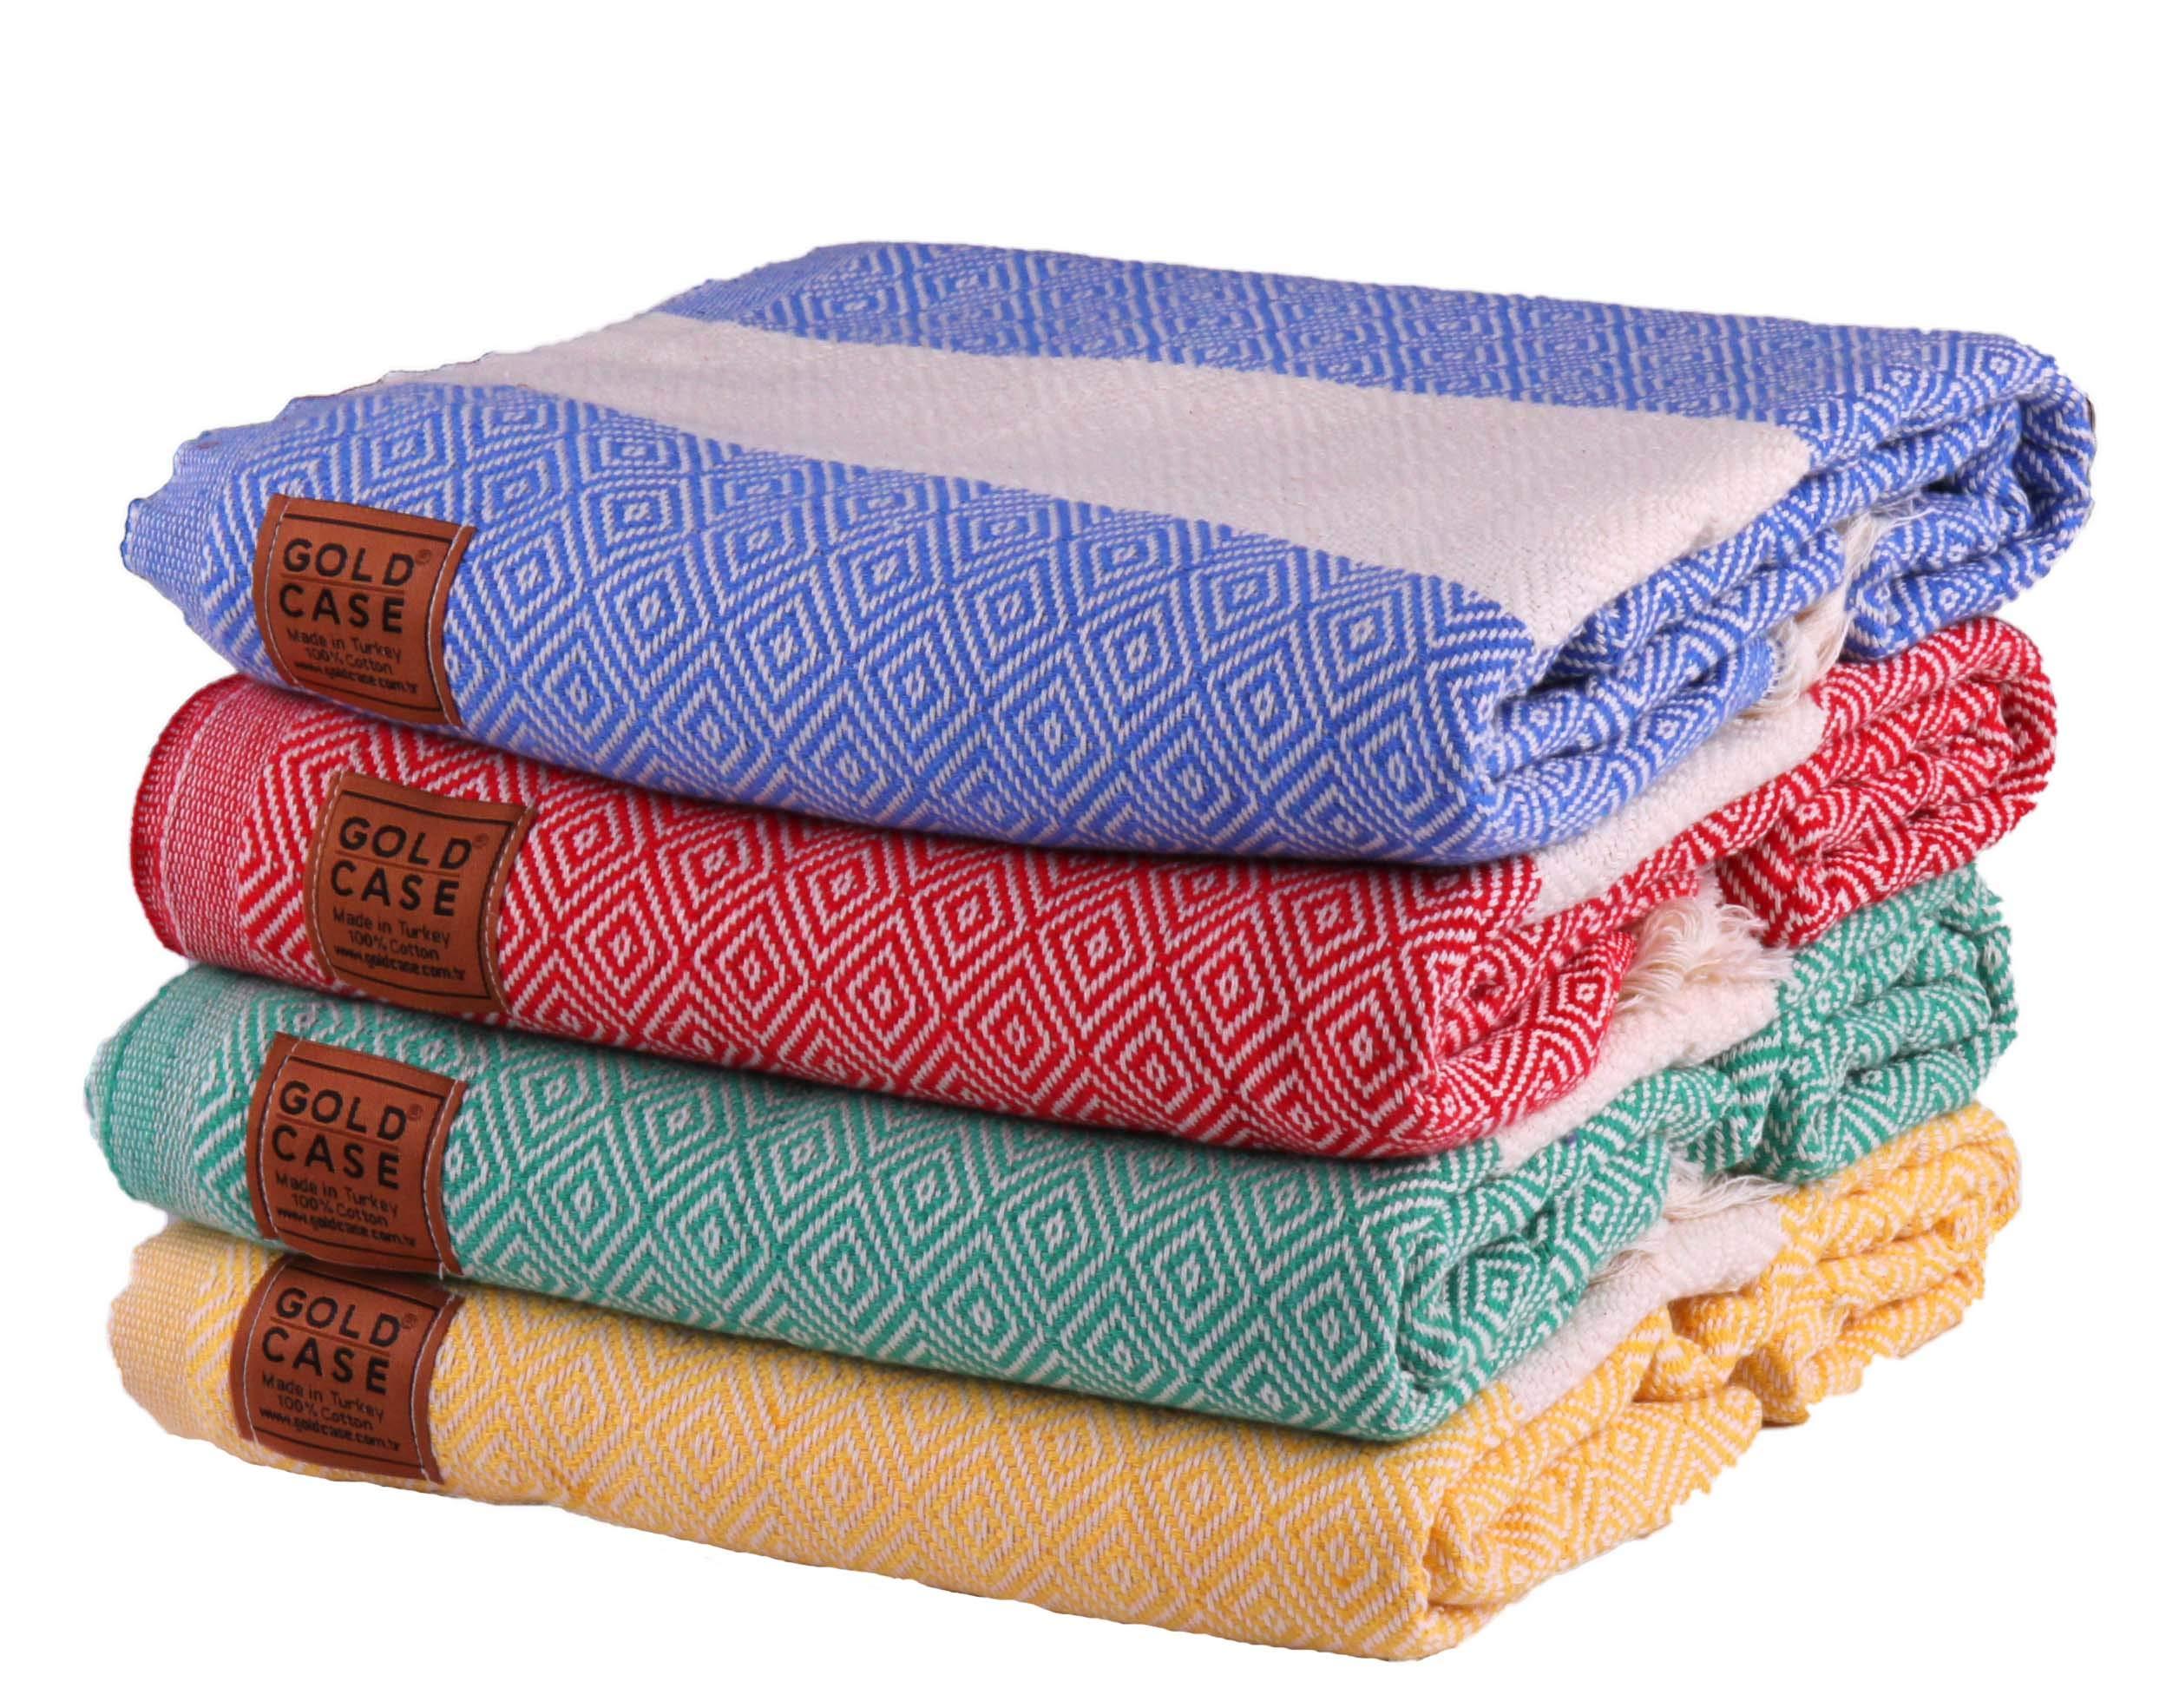 Gold Case Set of 4 XXL and Thick Hermes Turkish Cotton Bath Beach Hammam Towels Peshtemal Towel Throw Blanket (Multi)